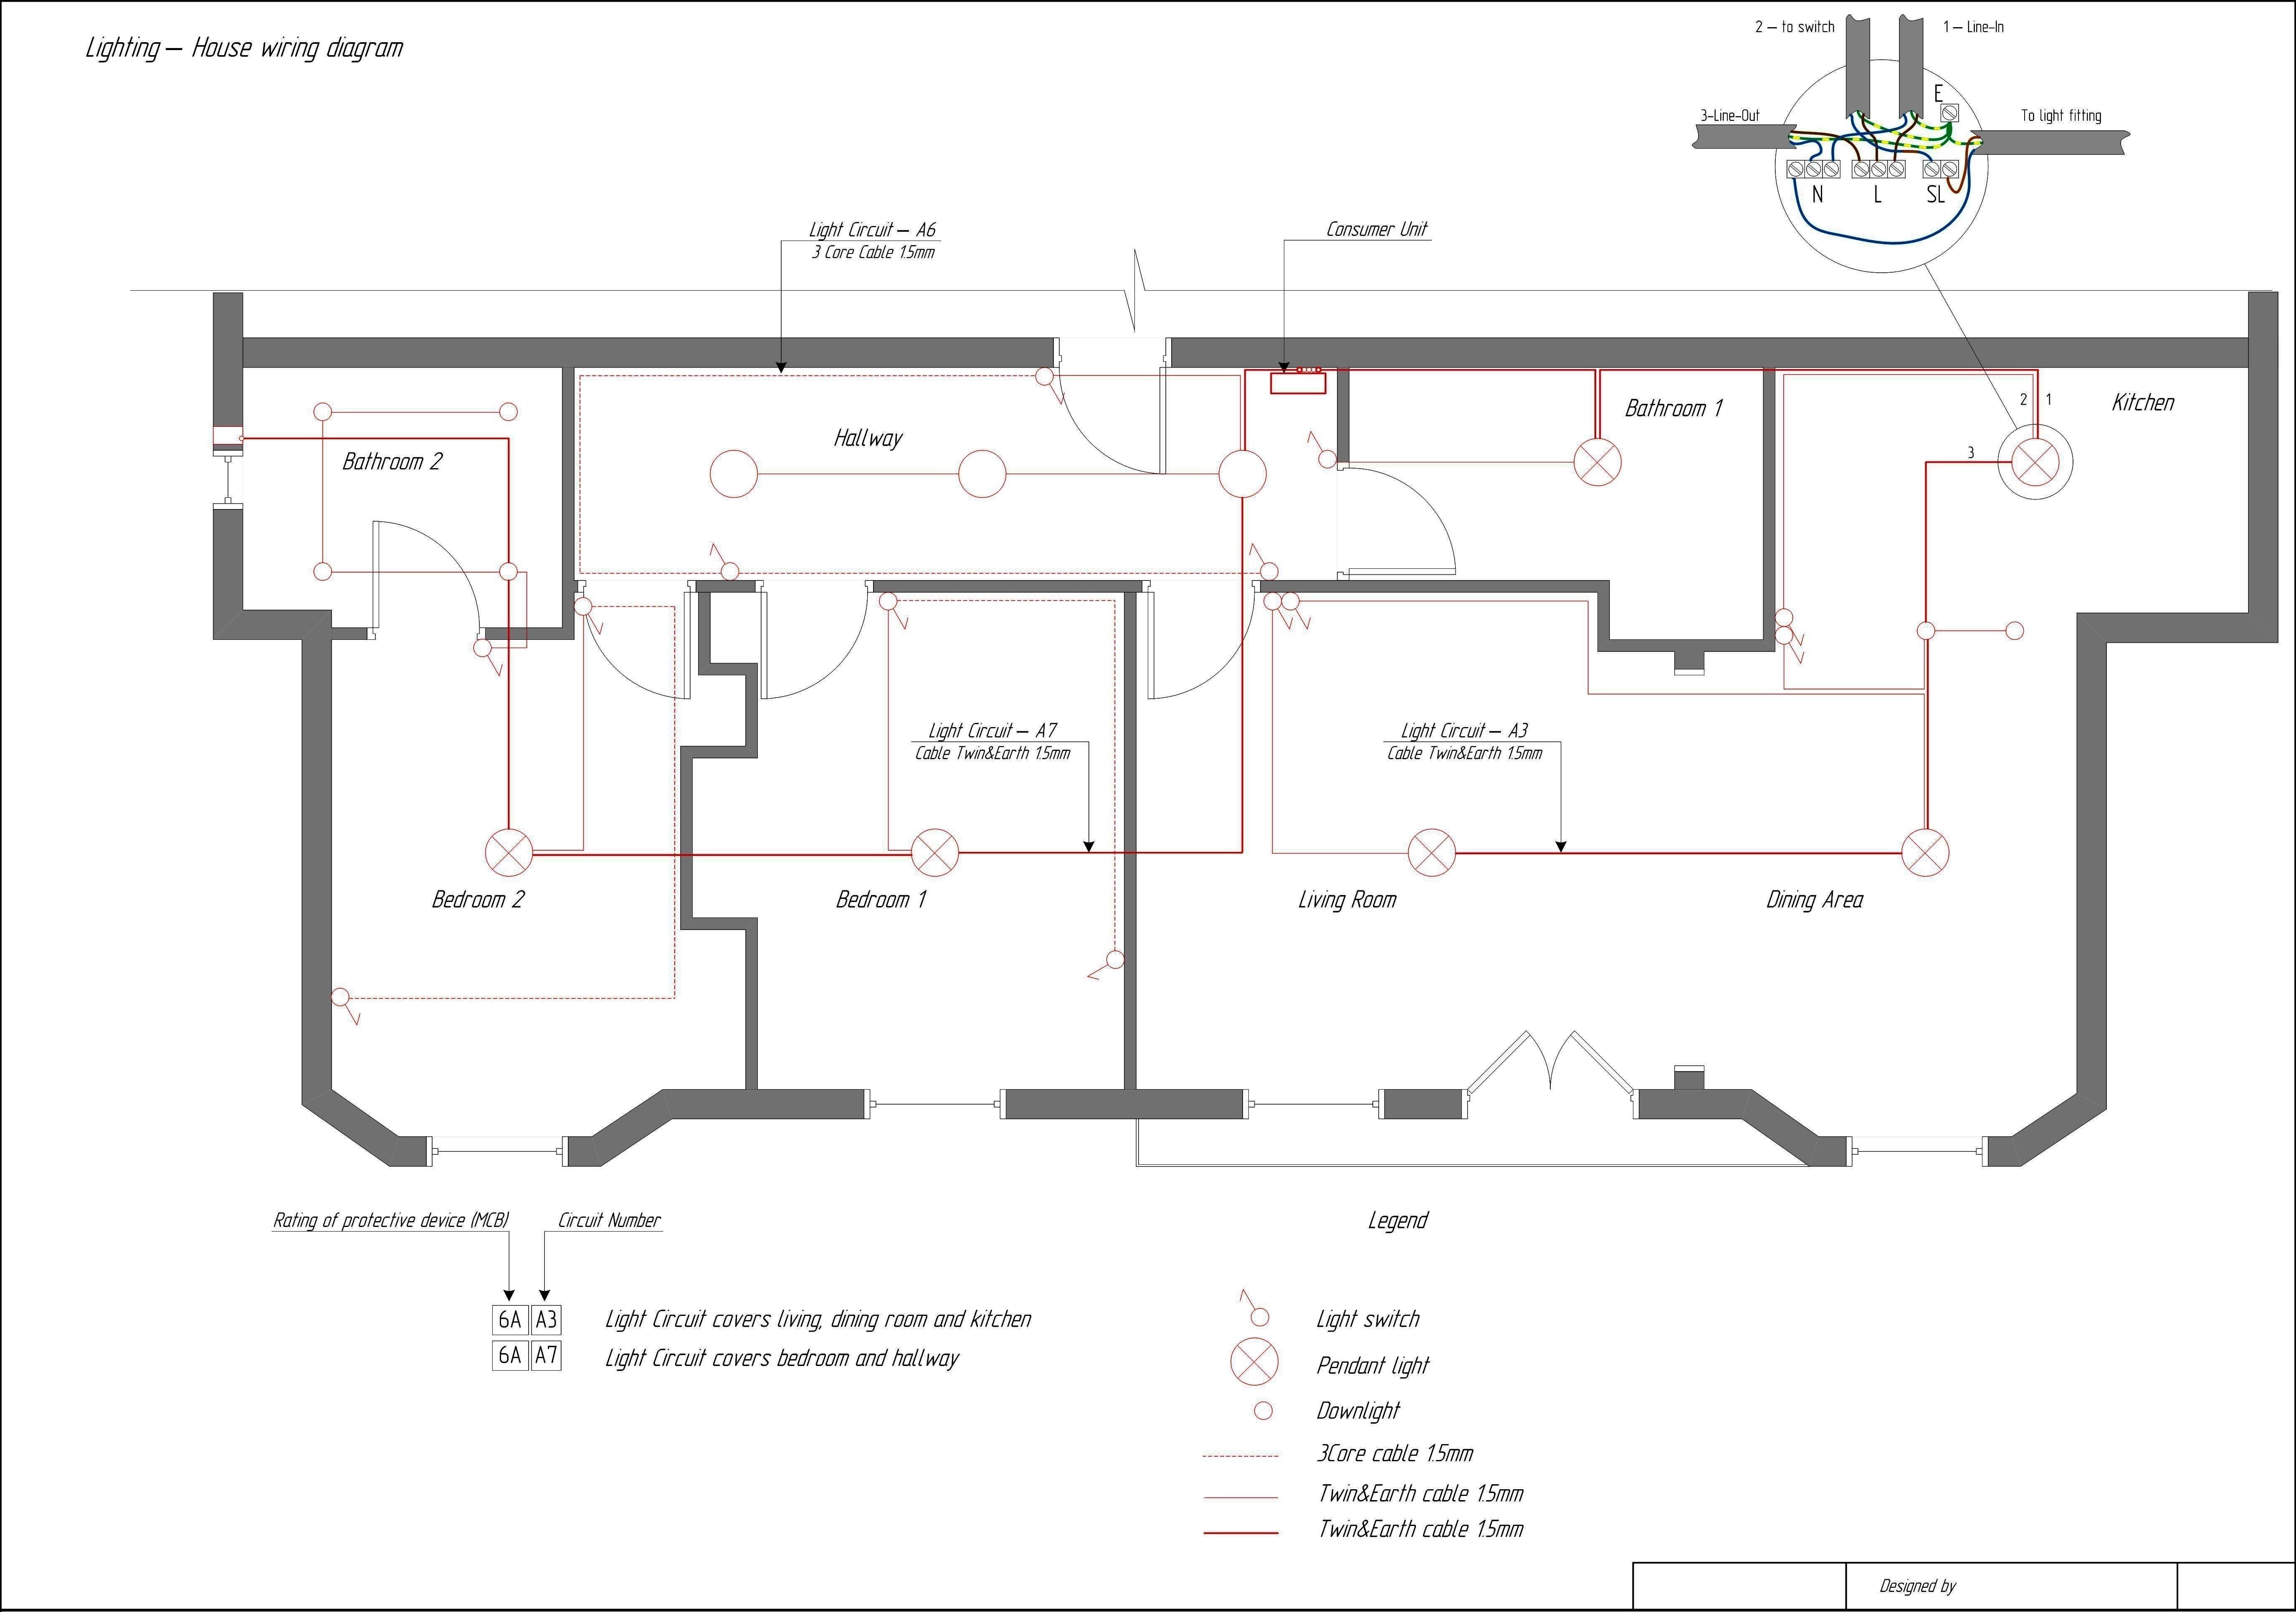 wiring diagram house lighting circuit schematics wiring diagrams u2022 rh seniorlivinguniversity co